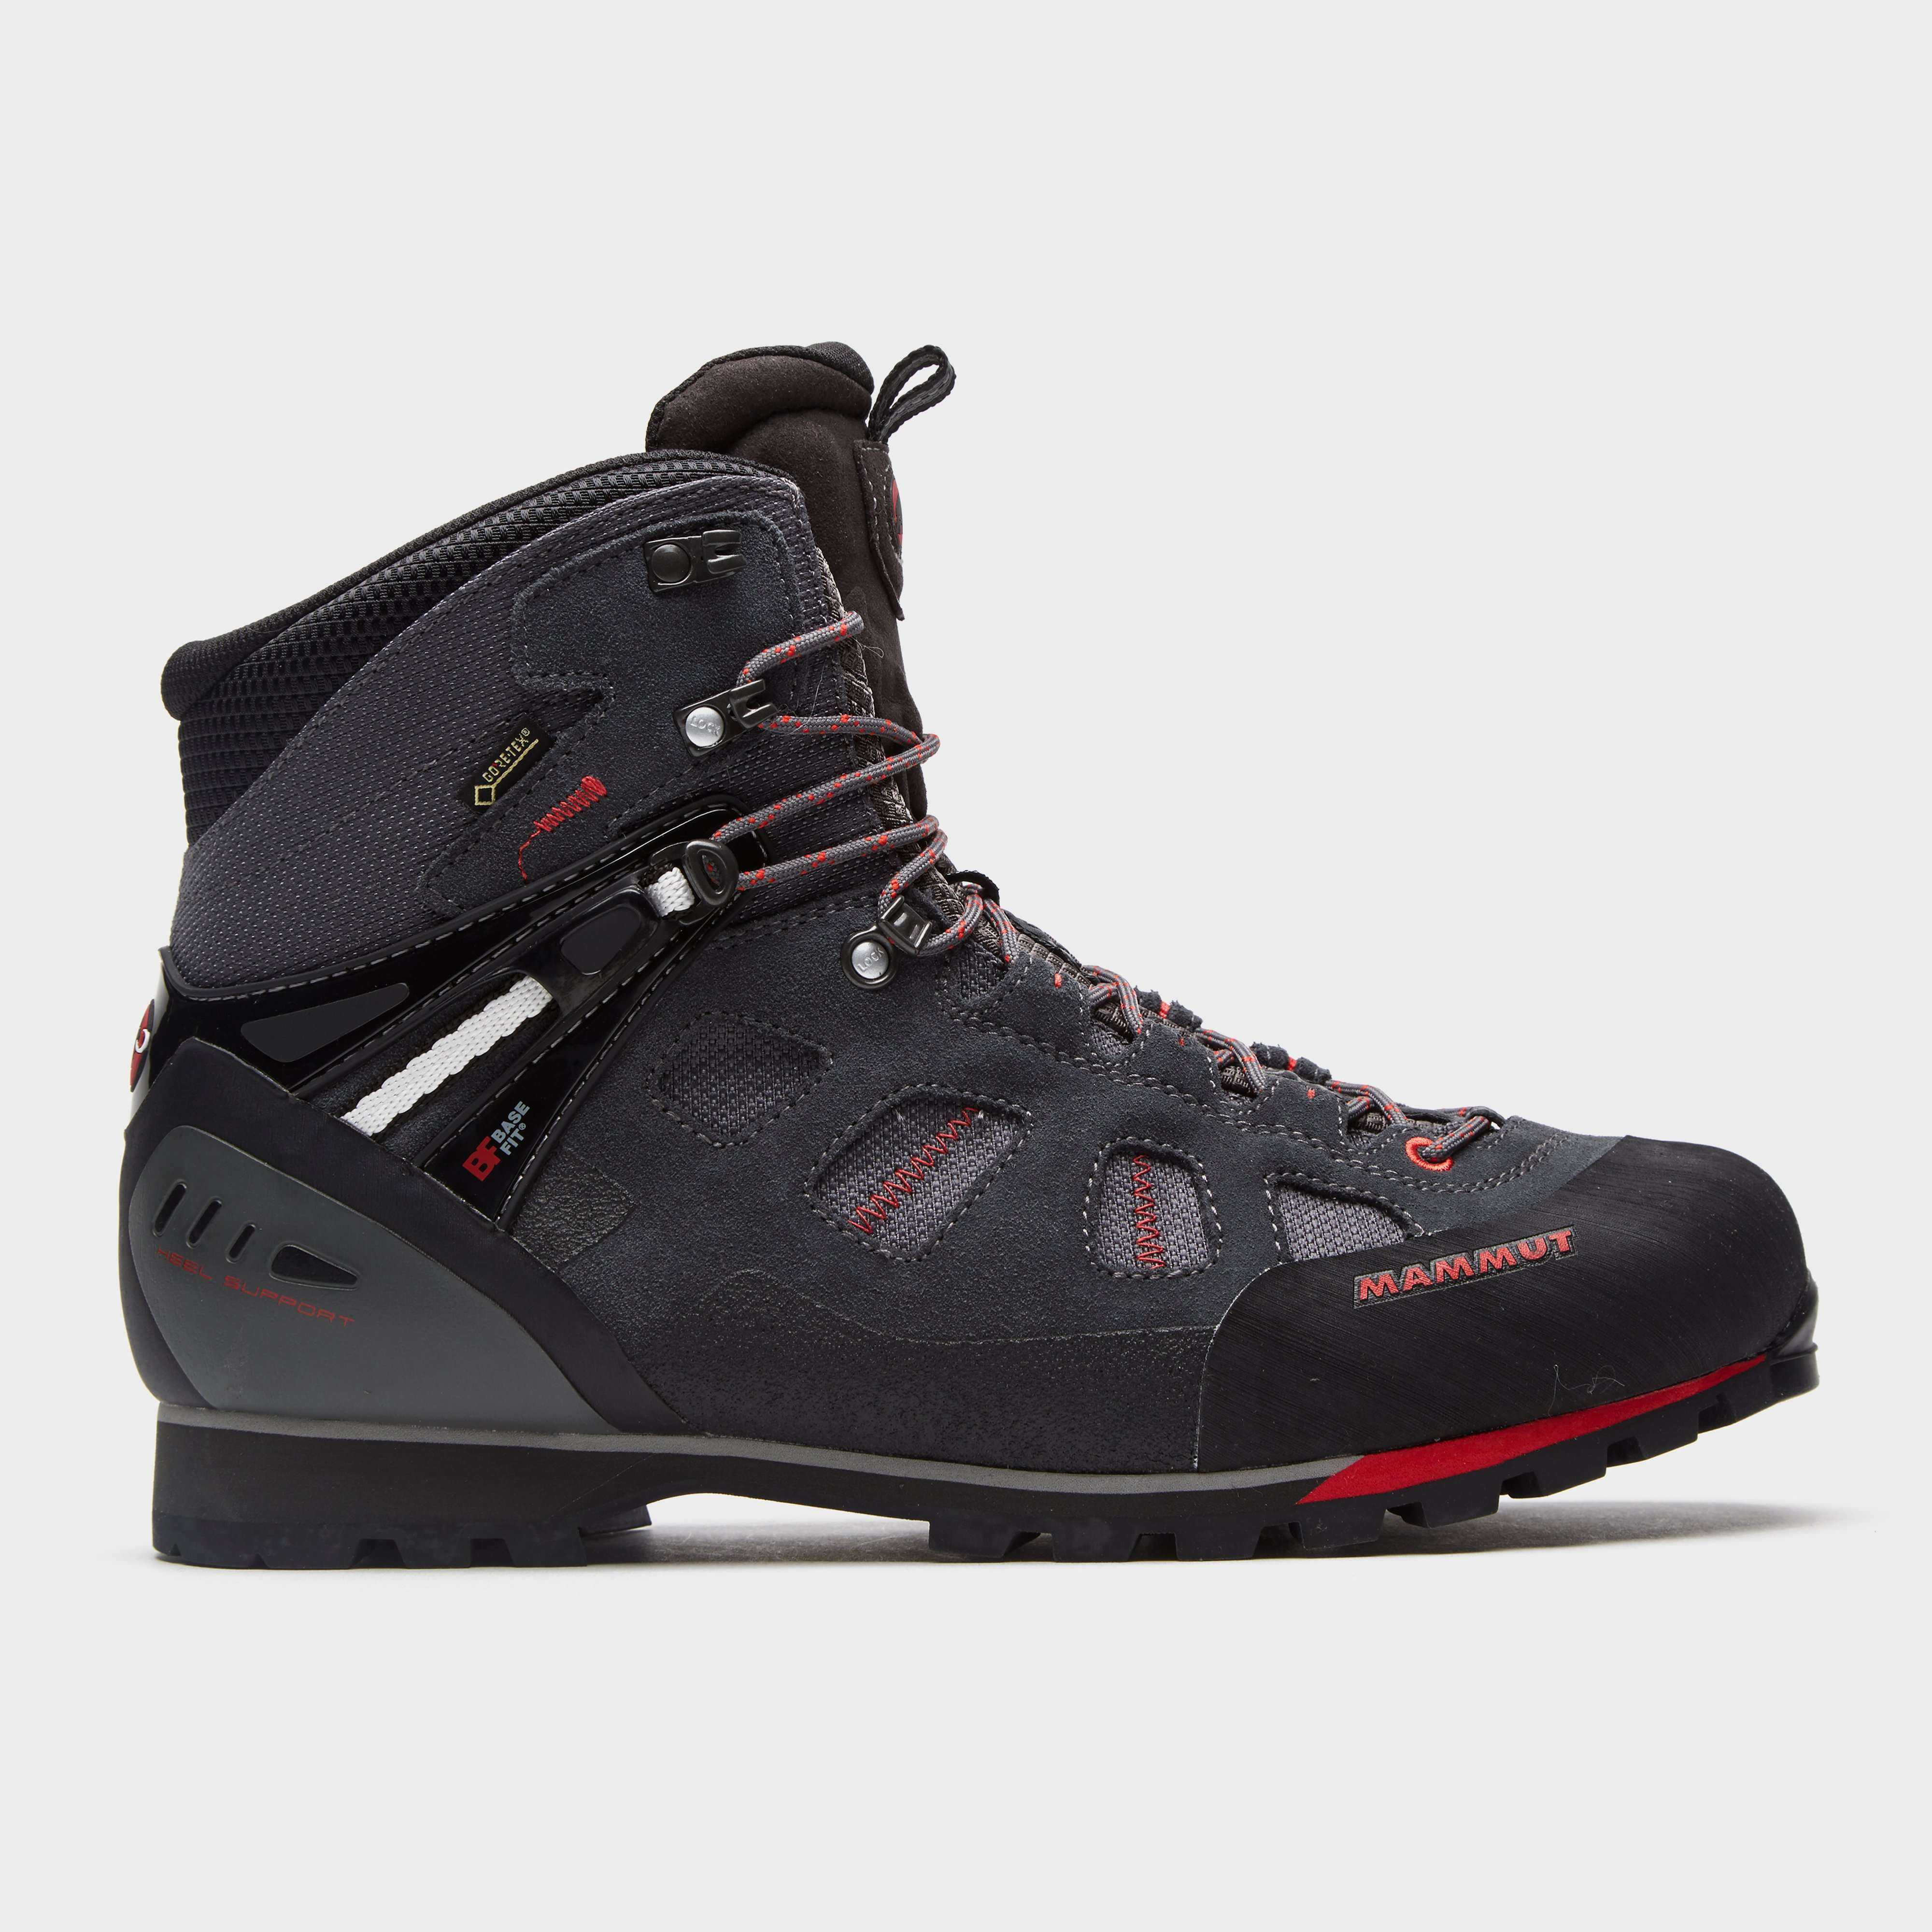 MAMMUT Men's Ayako High GORE-TEX® Boots